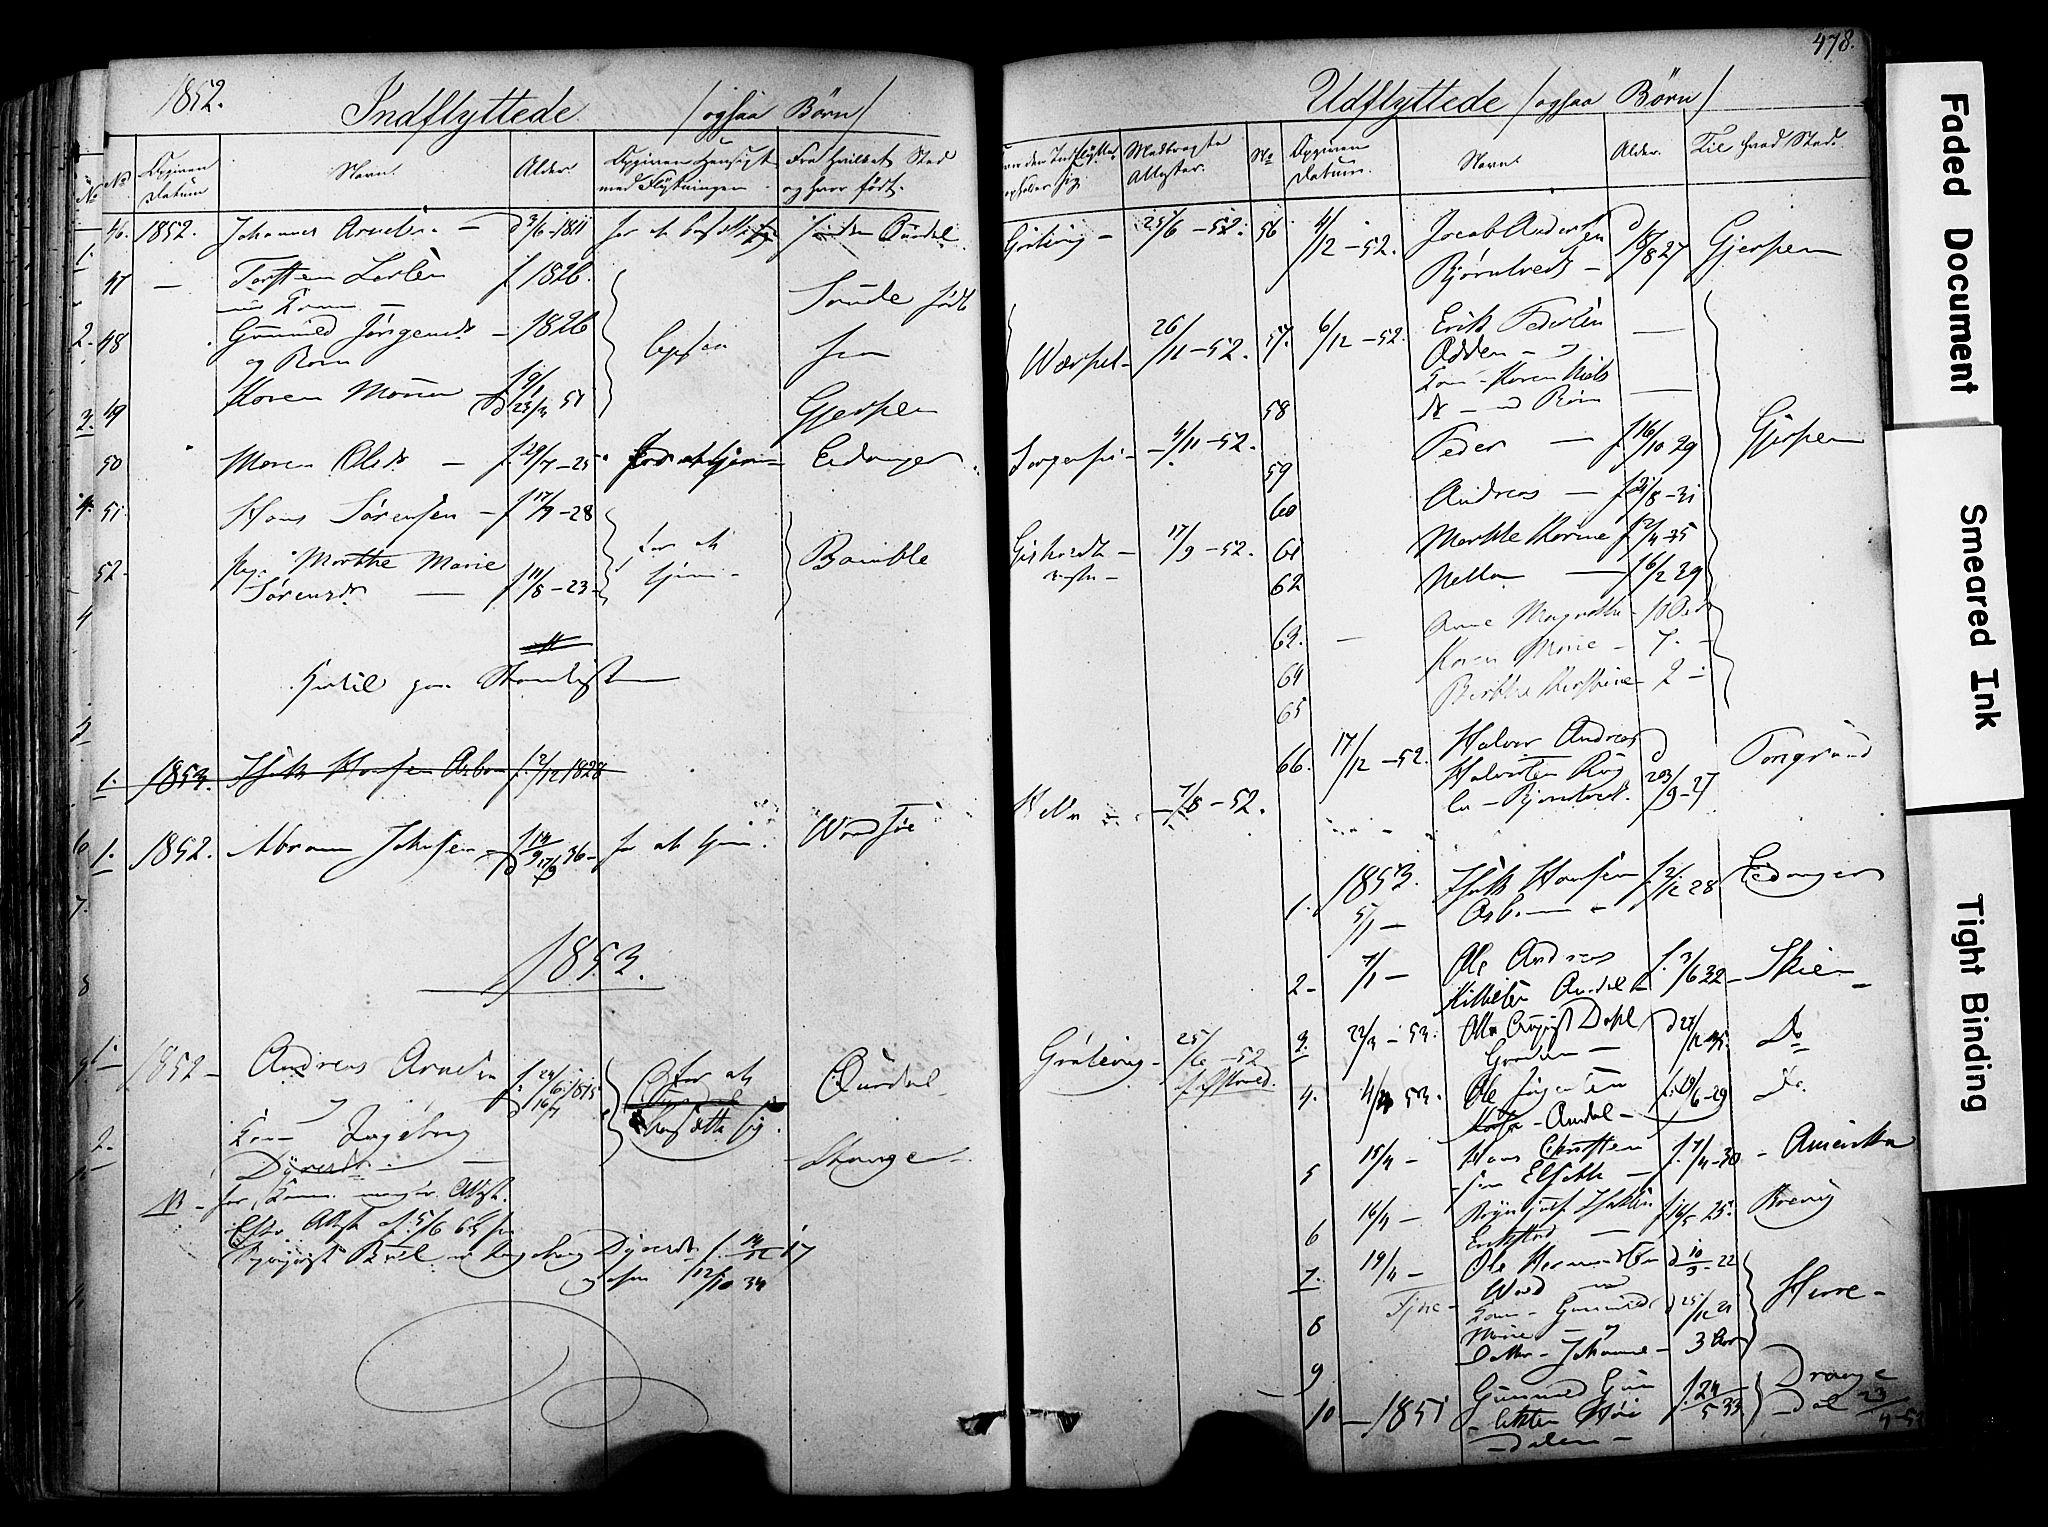 SAKO, Solum kirkebøker, F/Fa/L0006: Ministerialbok nr. I 6, 1844-1855, s. 478